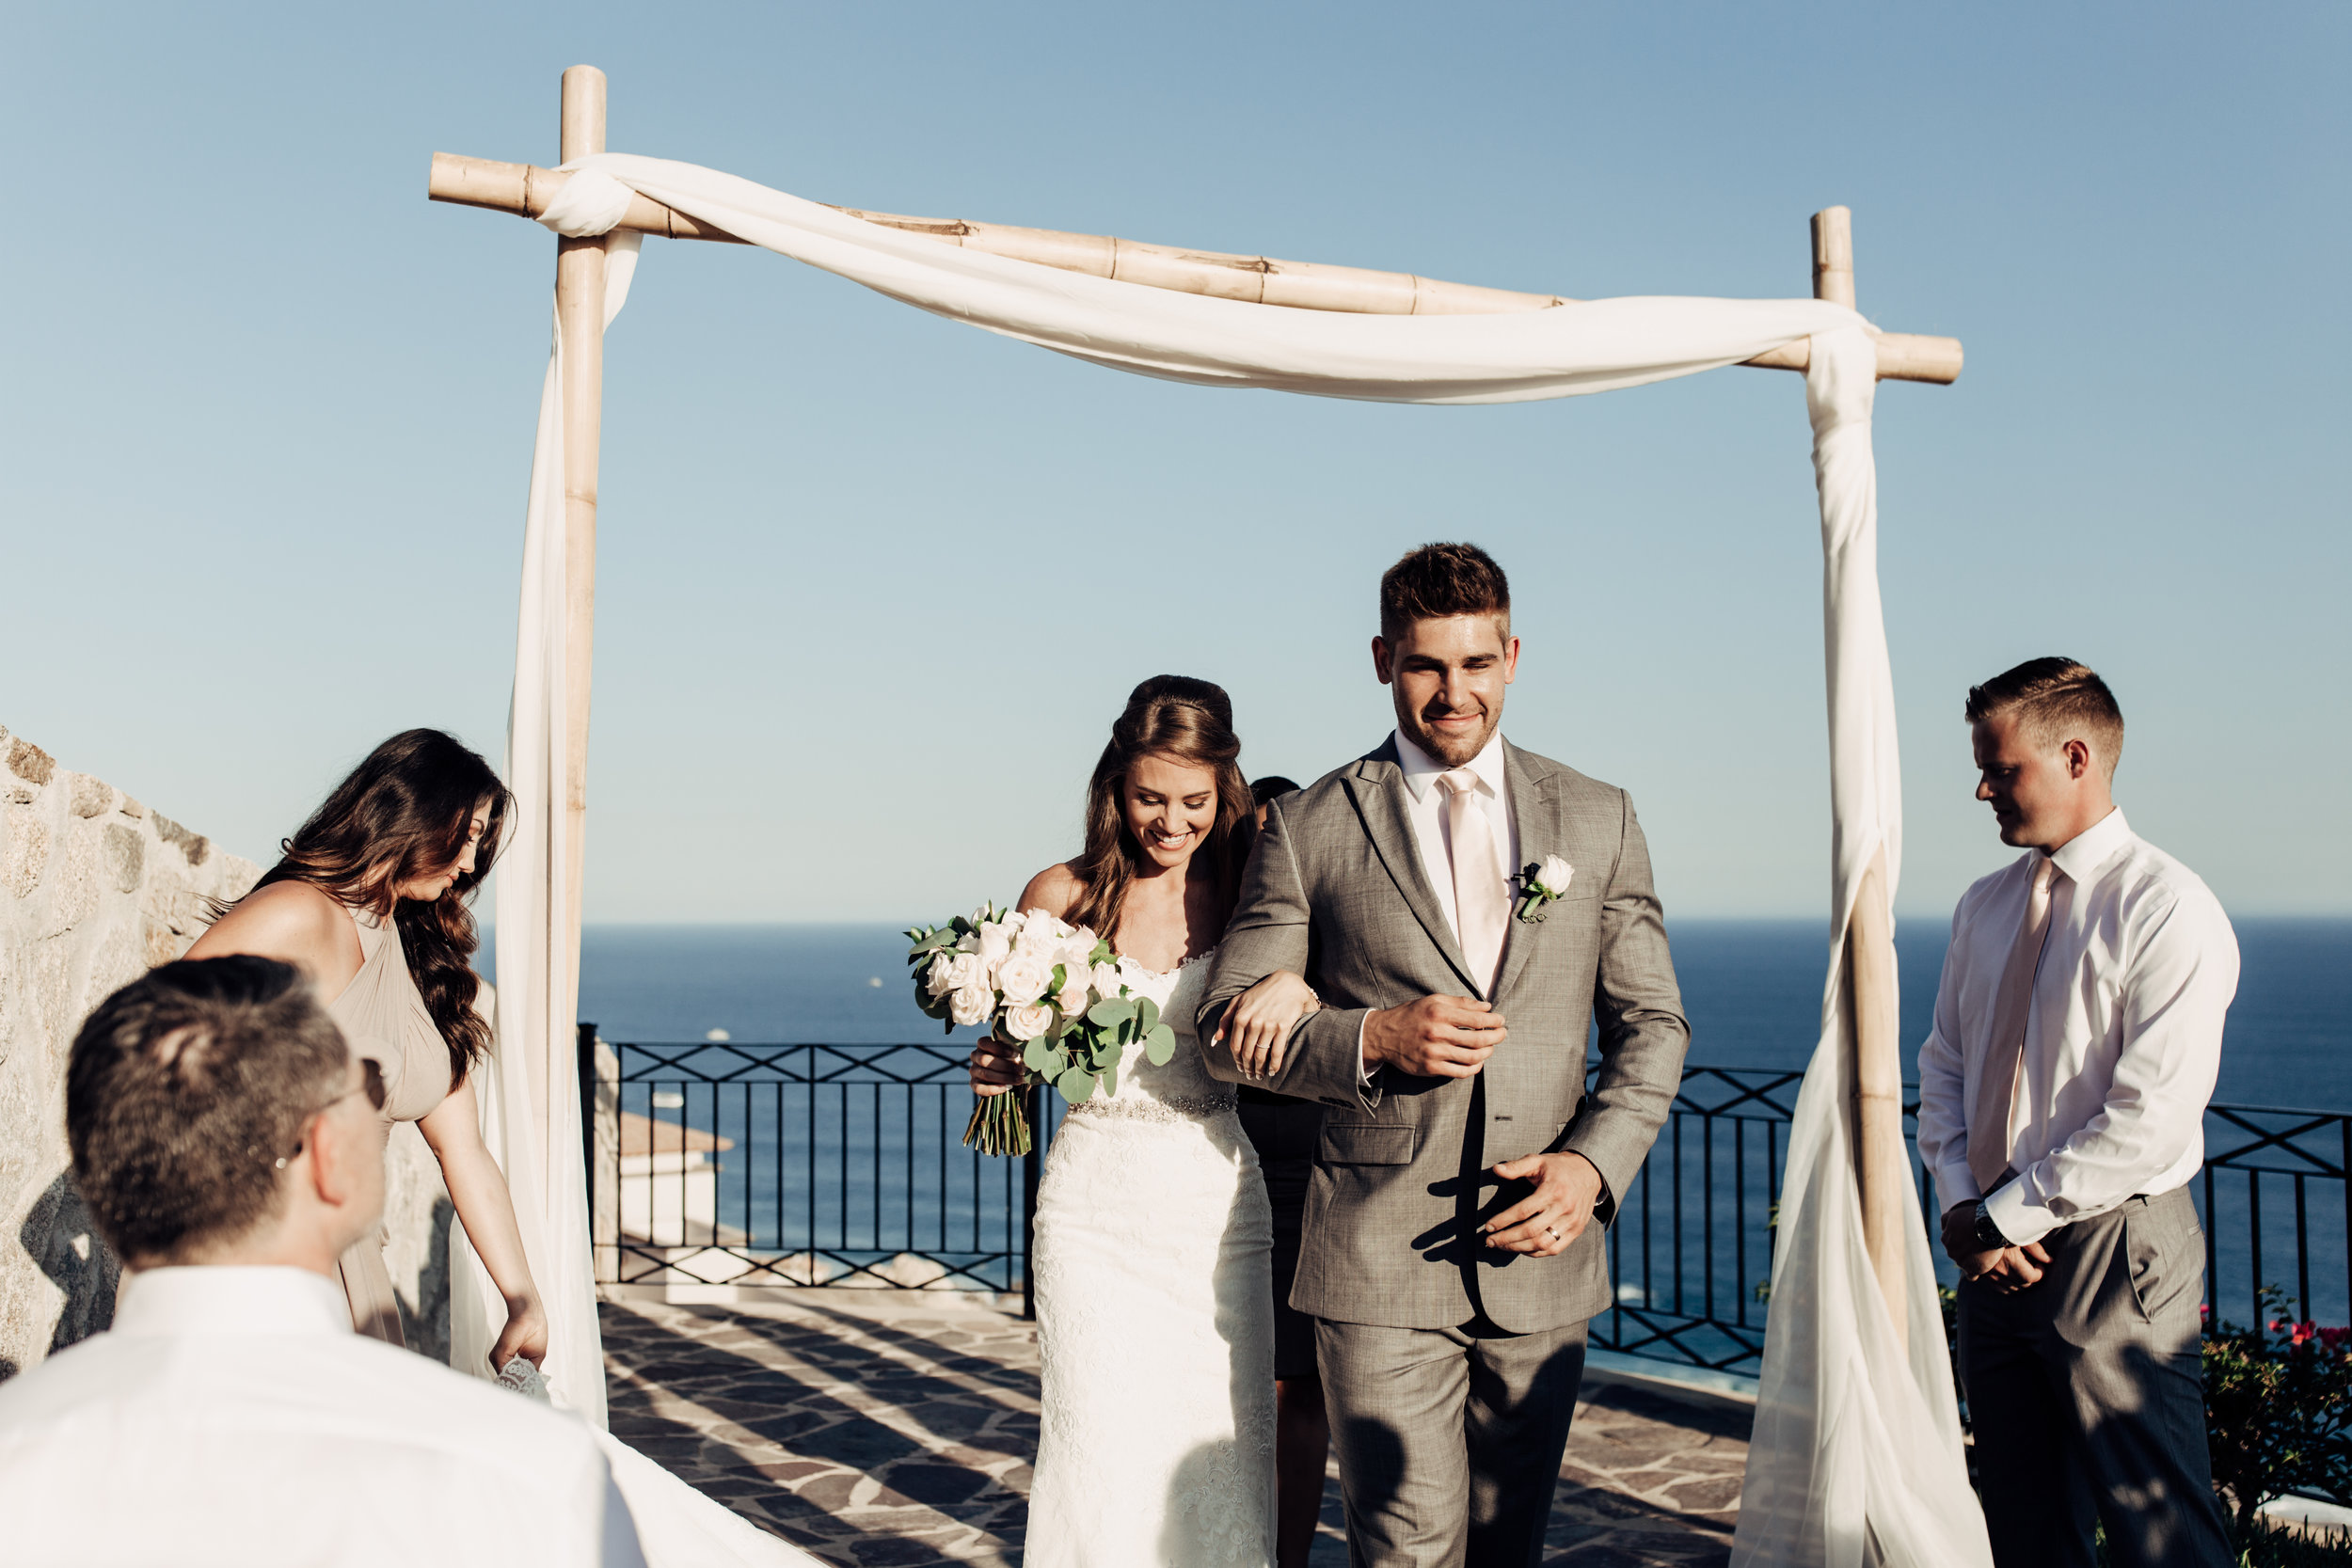 pueblo-bonito-sunset-beach-wedding-cabo-san-lucas344.jpg